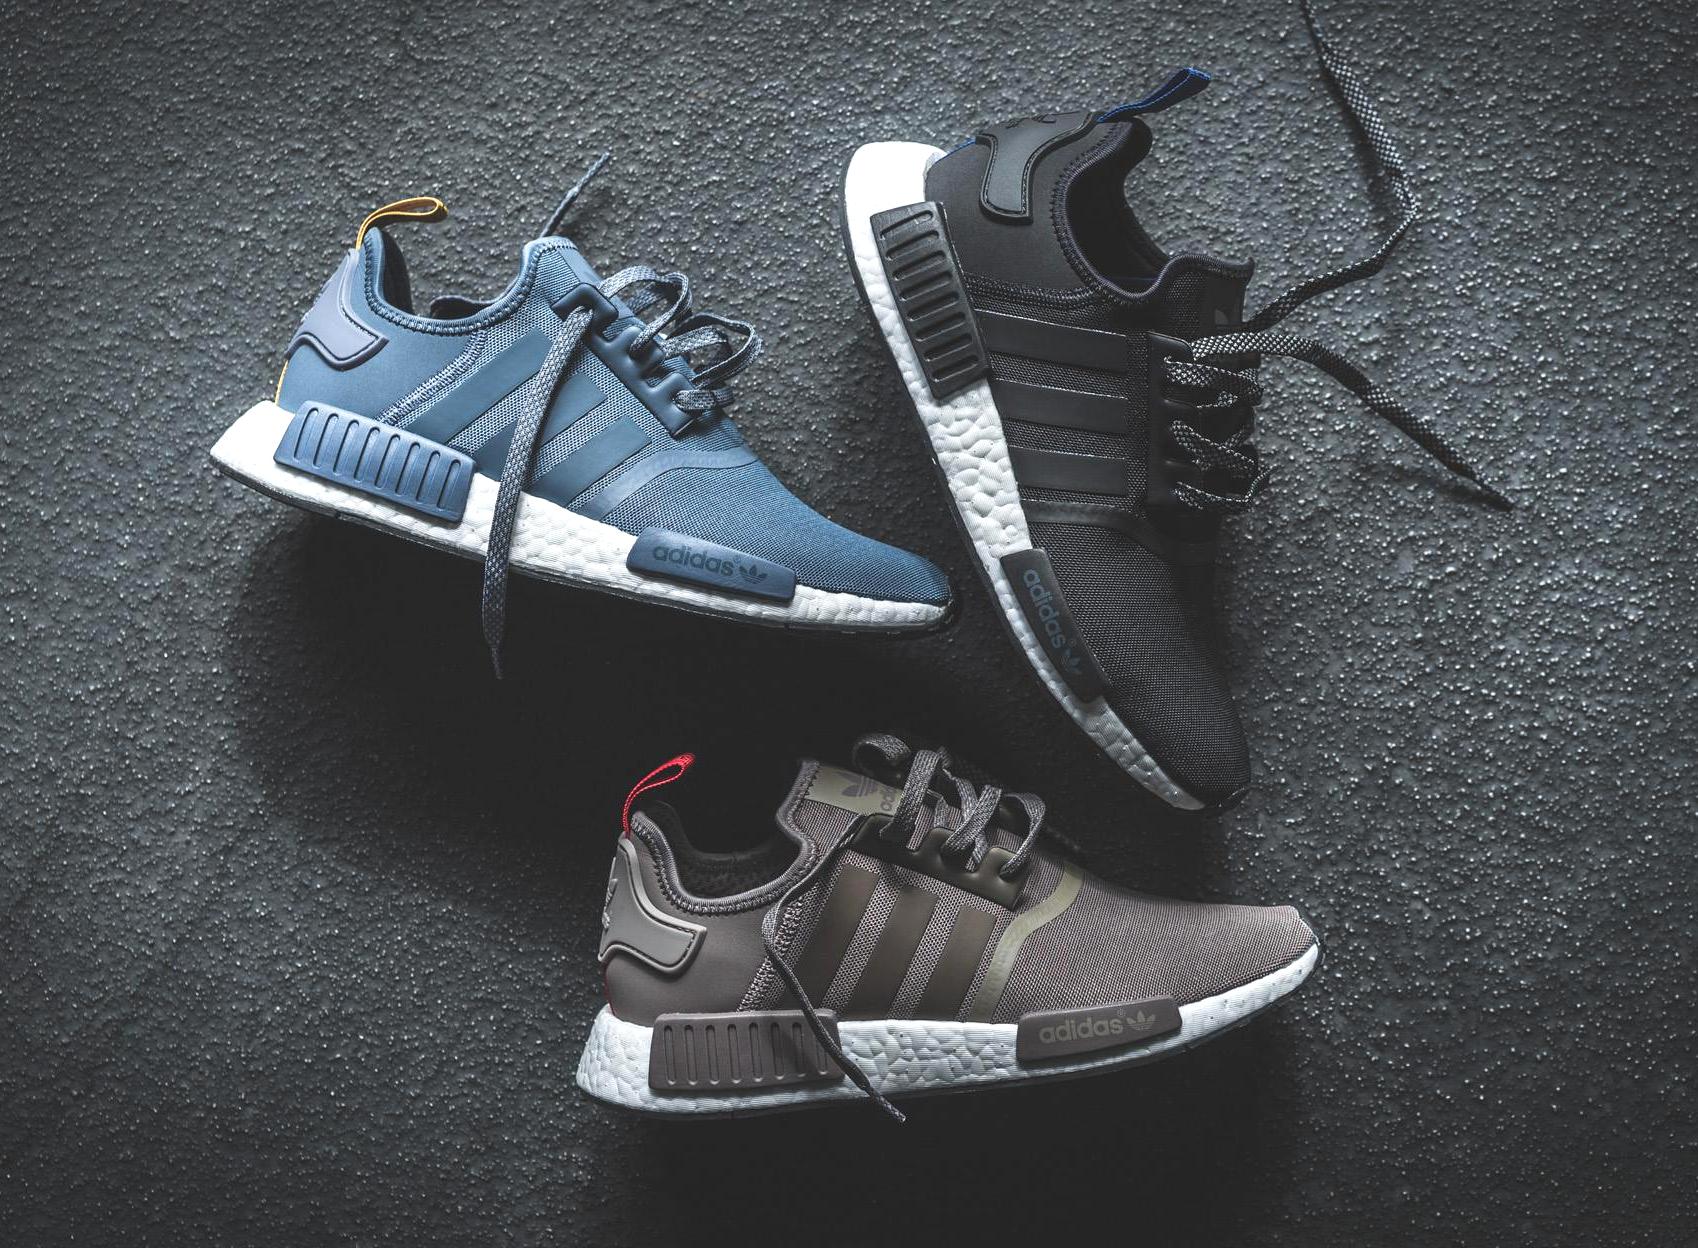 Adidas NMD R1 (marron, noir & bleu clair)